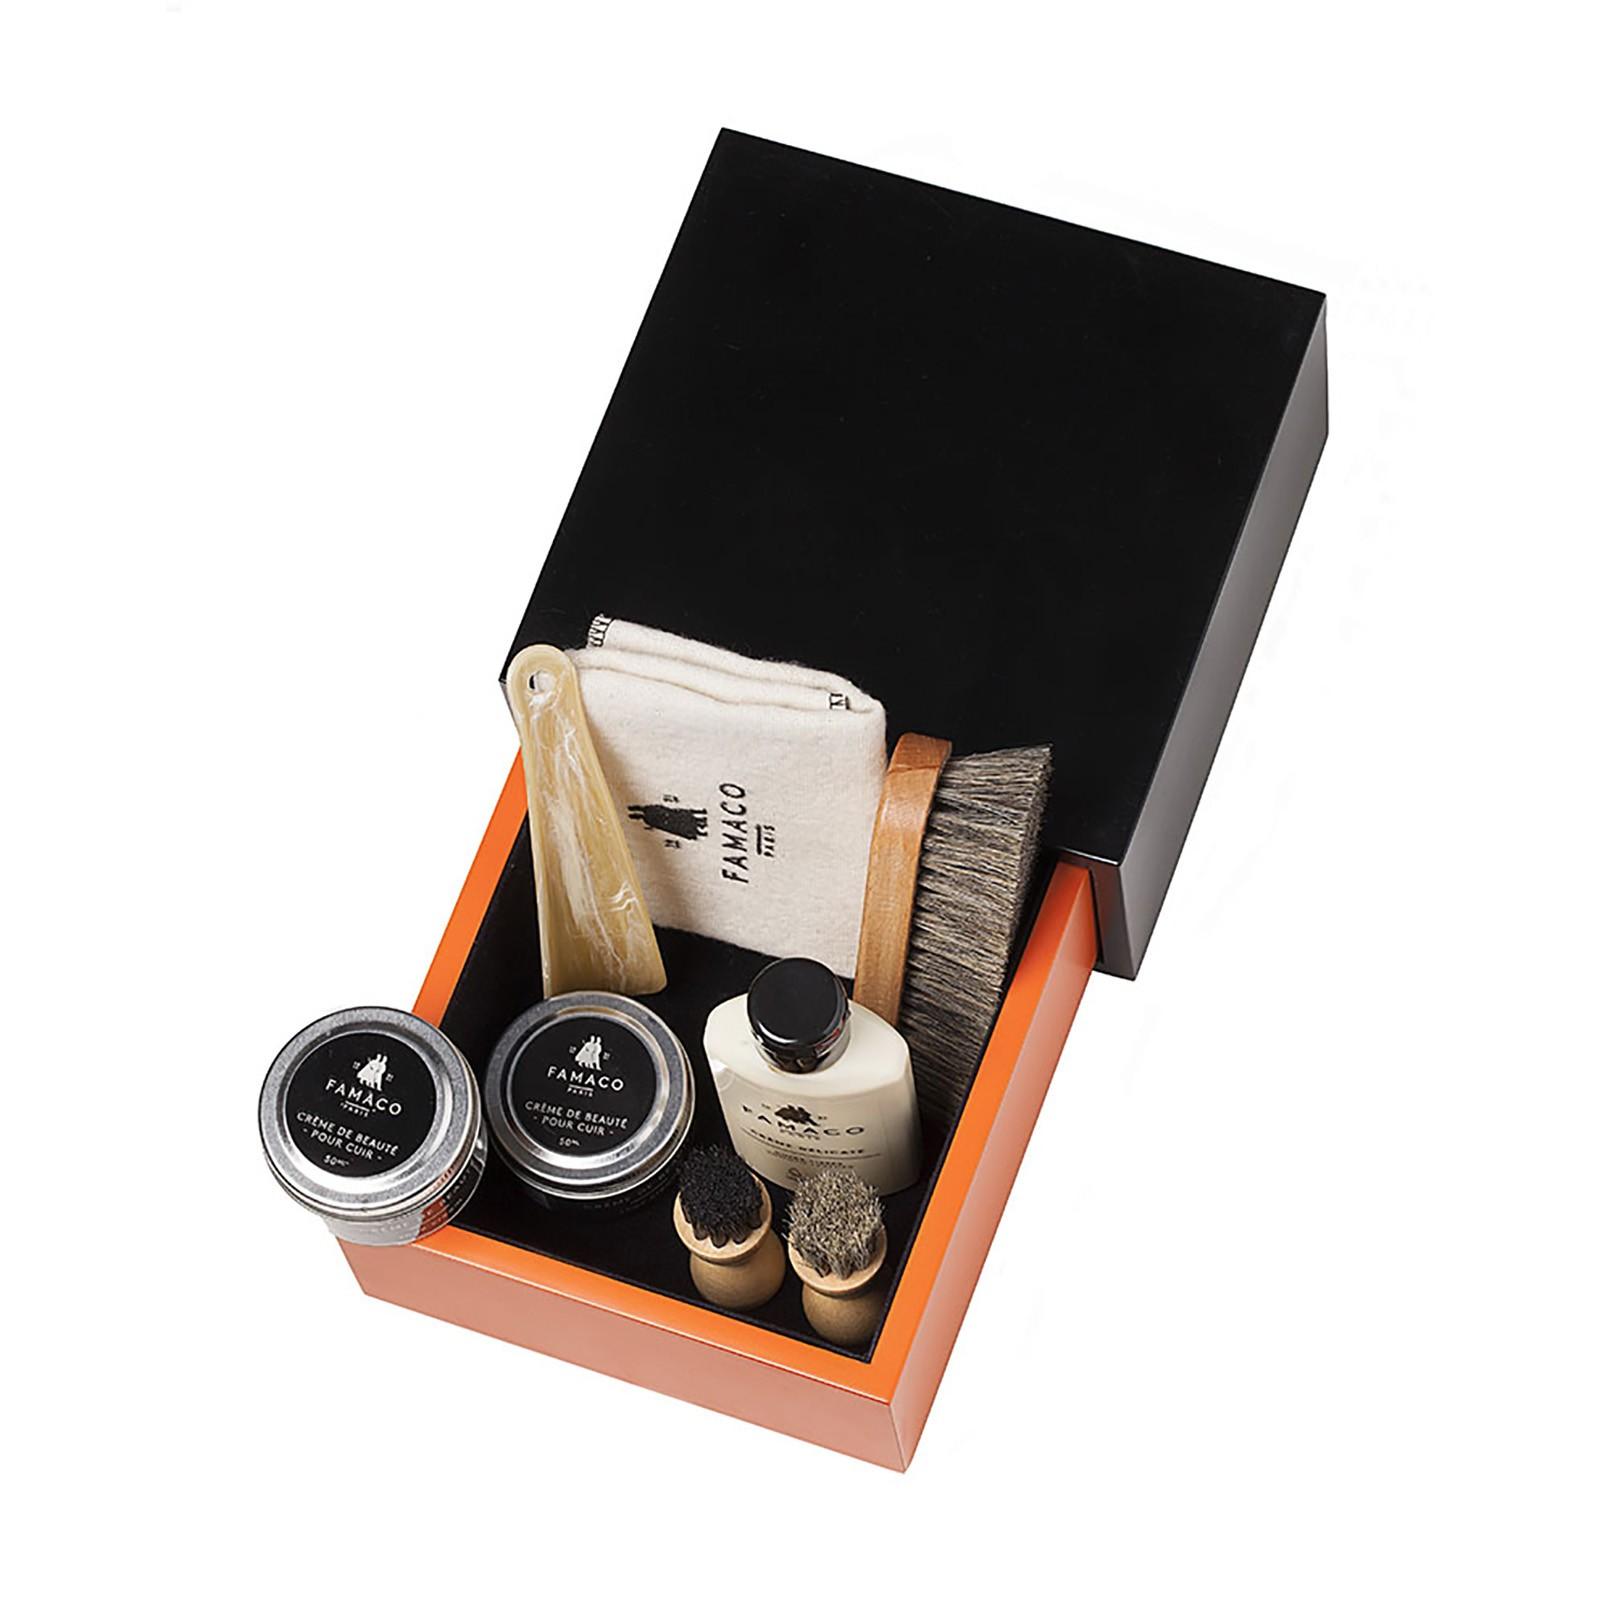 Famaco Cezanne Kit Box Black/orange - Filled